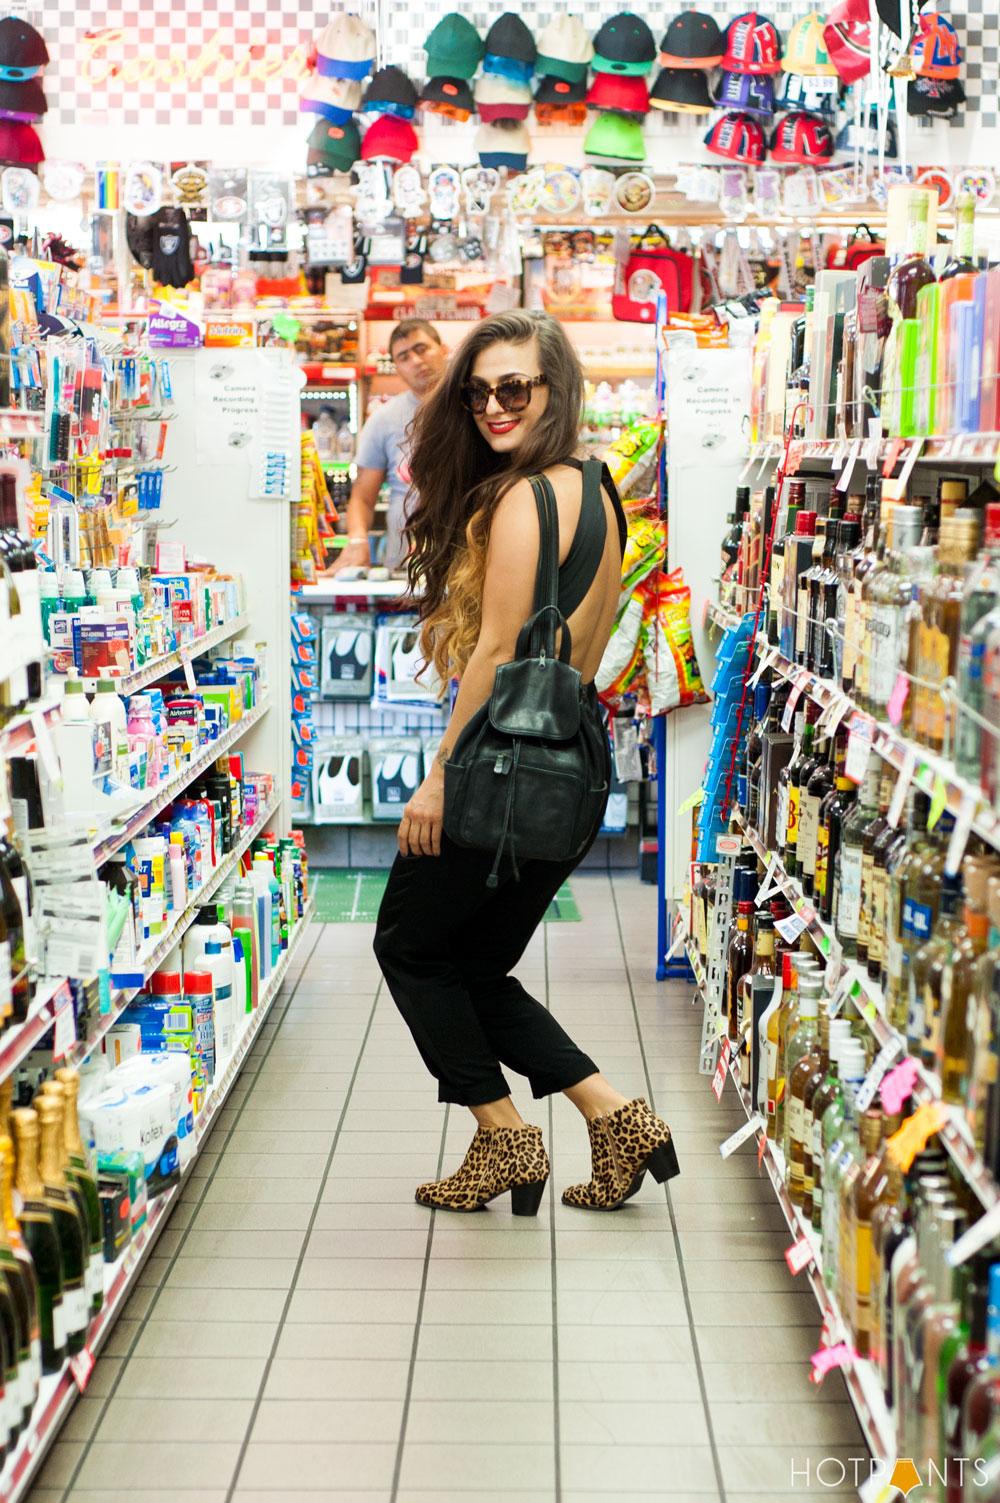 Girl Woman Funny Bodega Liquor Store Red Lipstick Leopard Print Sunglasses